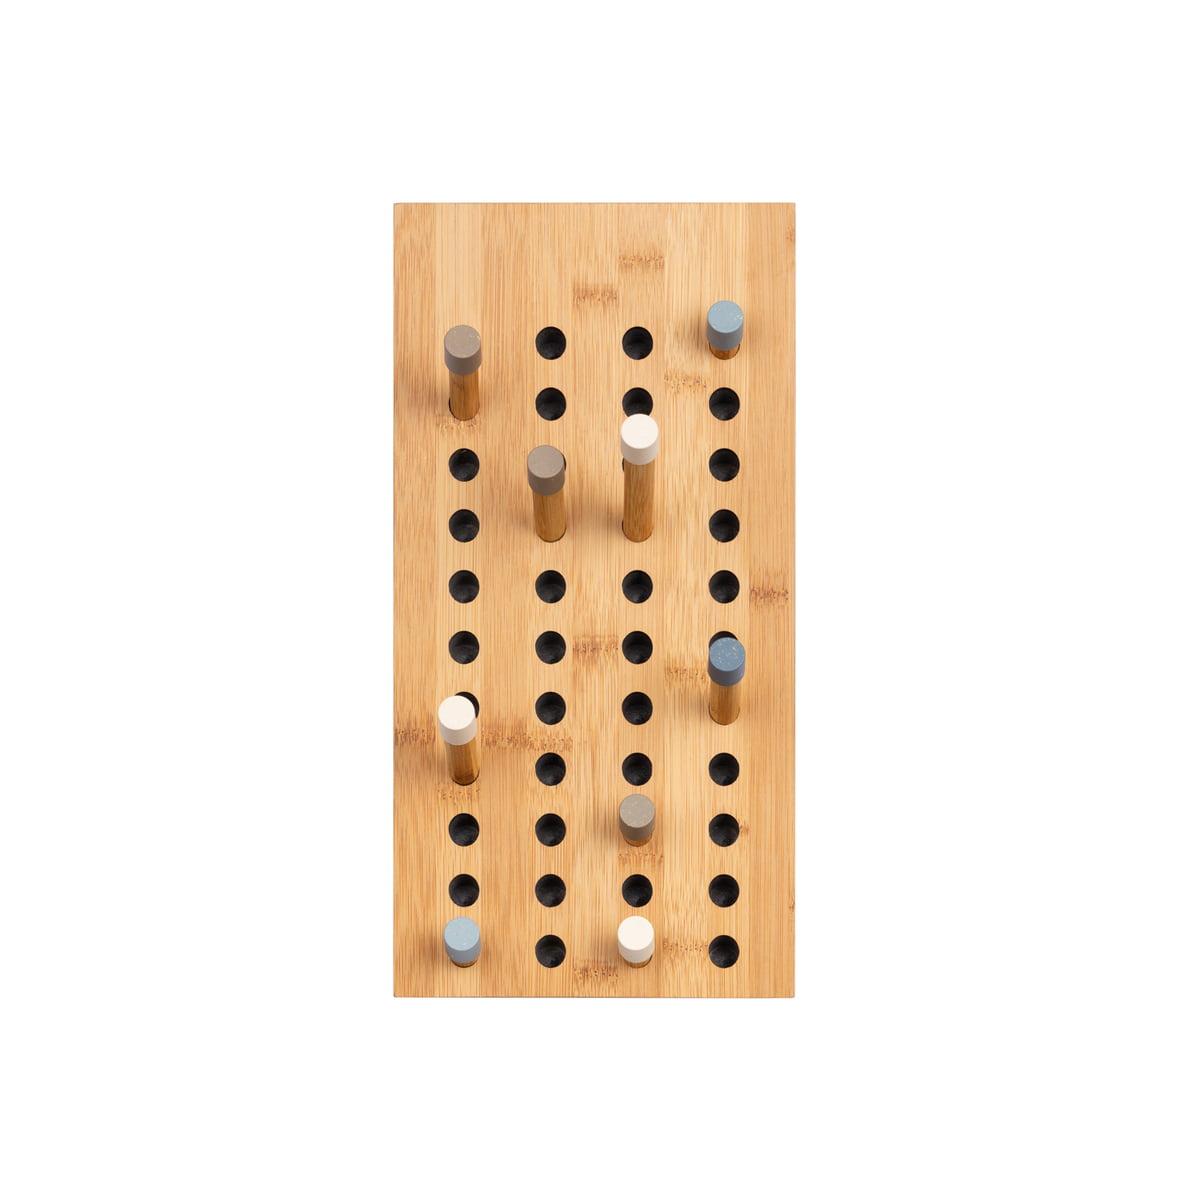 we do wood scoreboard garderobe aus holz. Black Bedroom Furniture Sets. Home Design Ideas